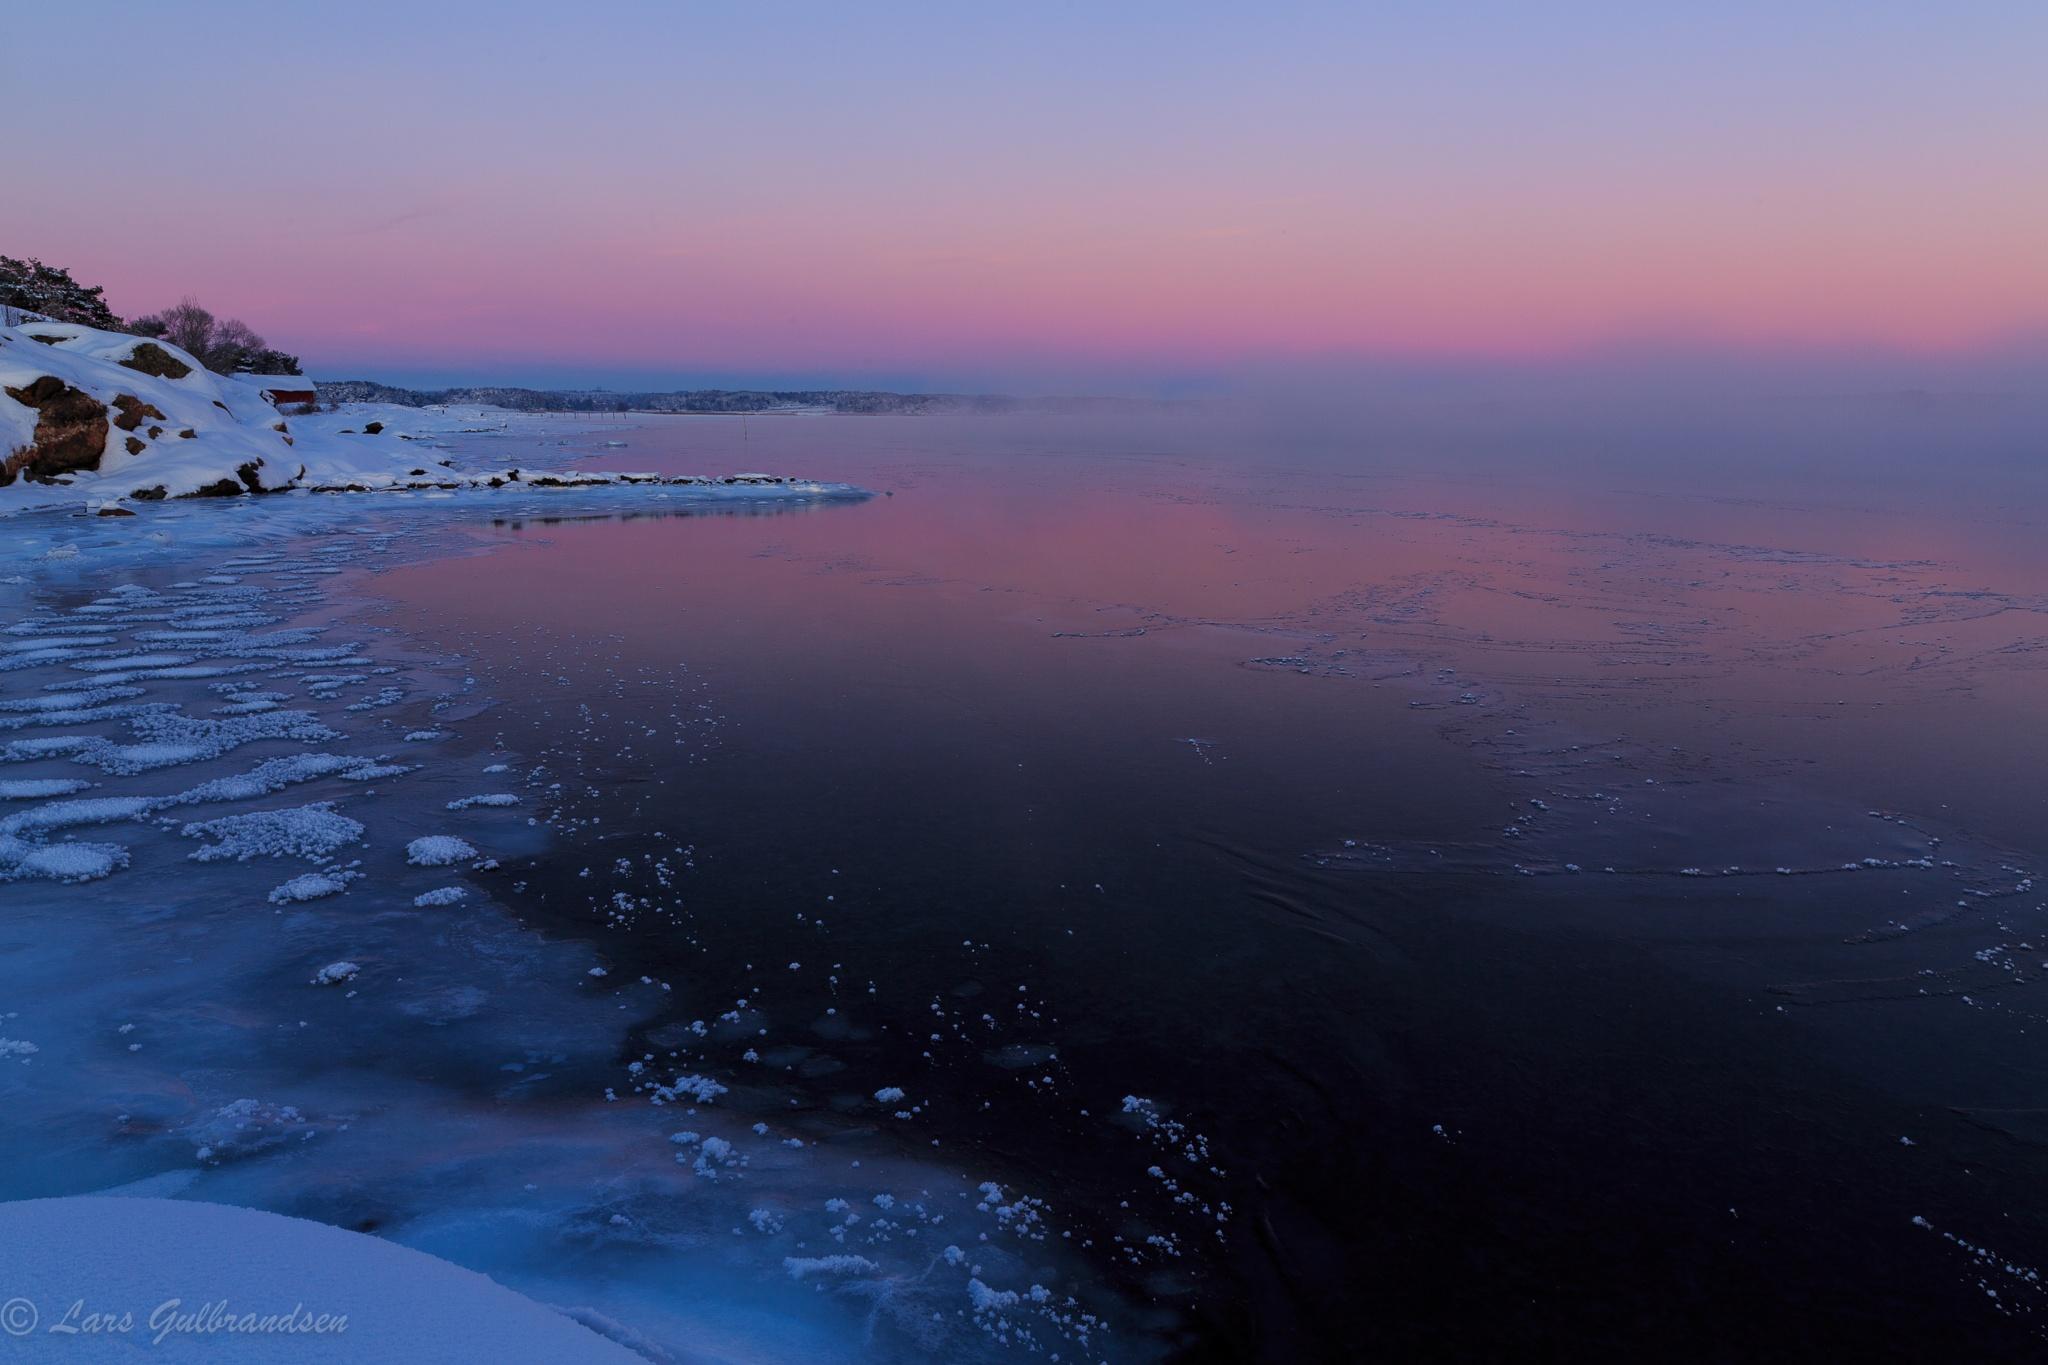 #1 Kurefjorden  by Lars Gulbrandsen